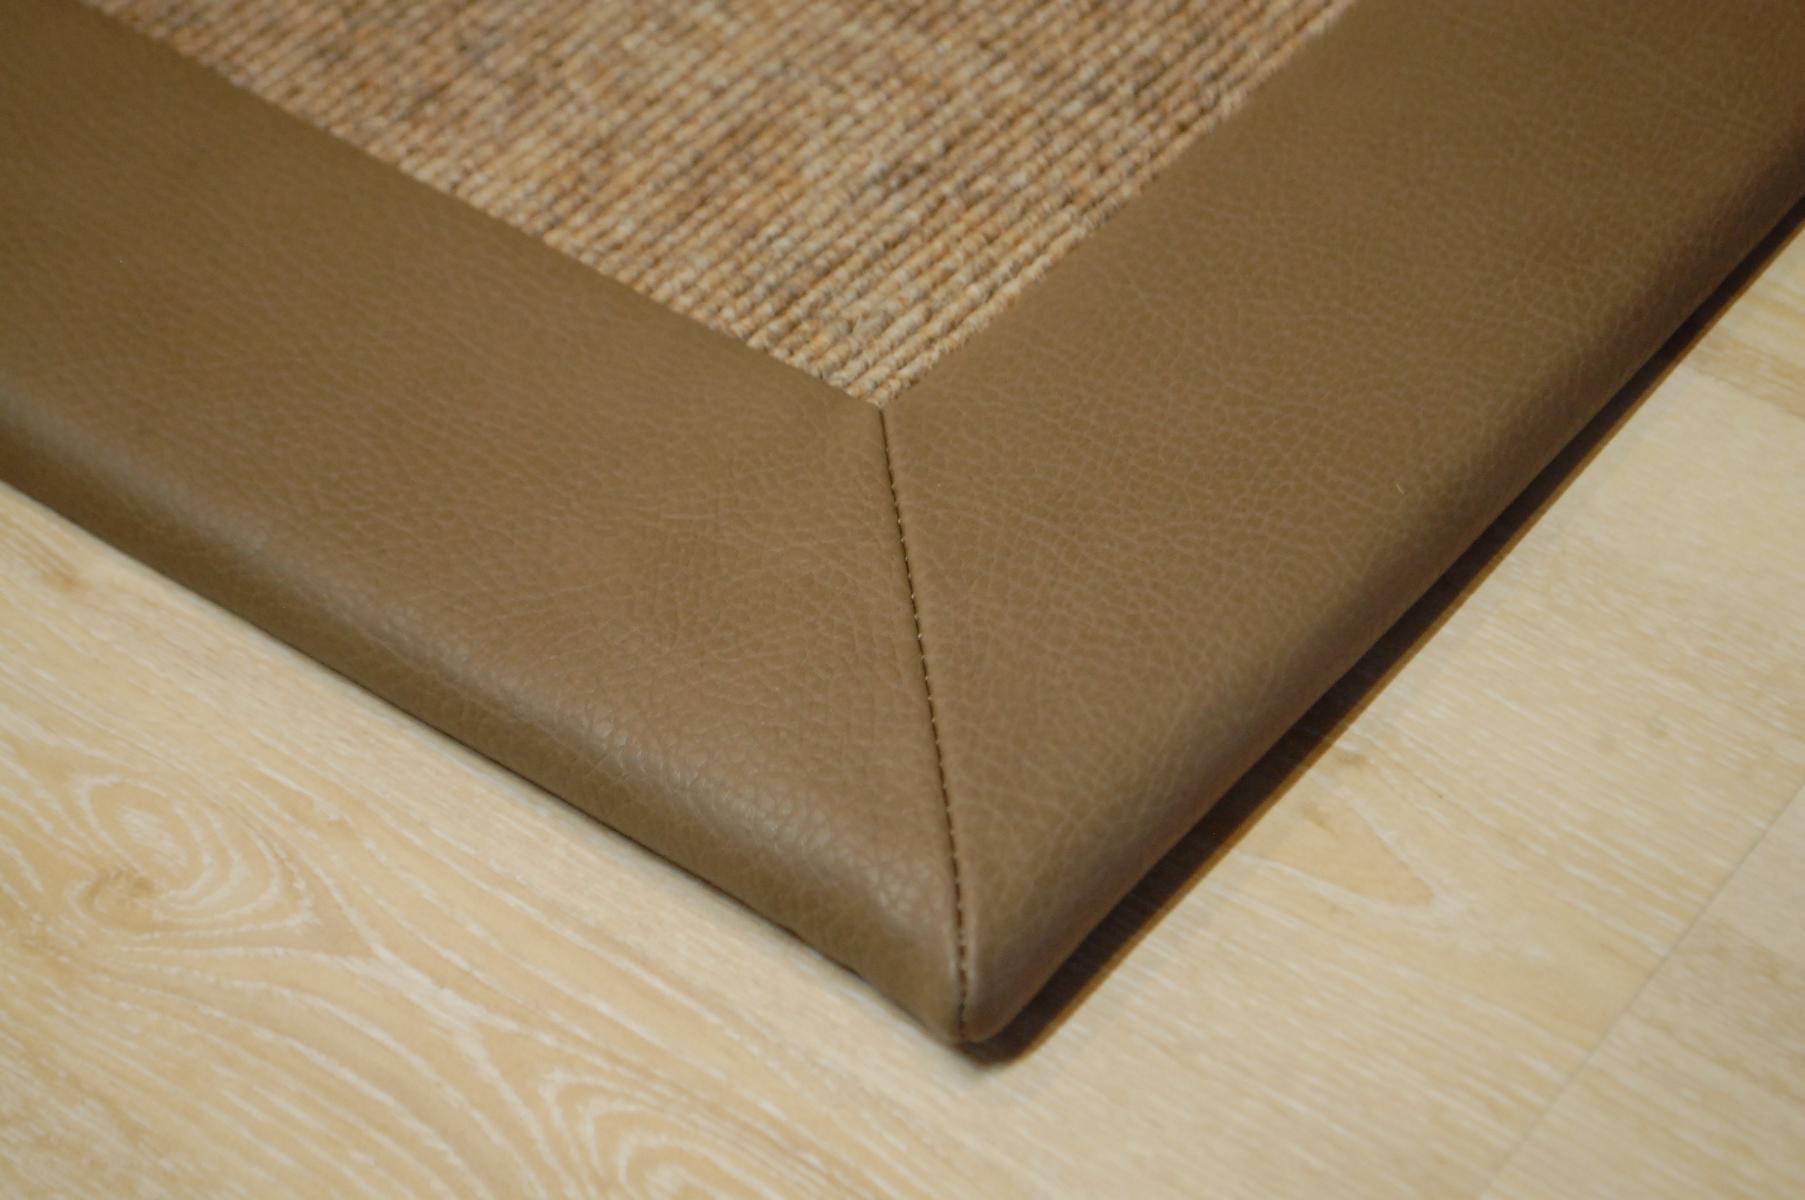 teppich tretford 571 kunstleder bord re 200x250 cm braun ebay. Black Bedroom Furniture Sets. Home Design Ideas